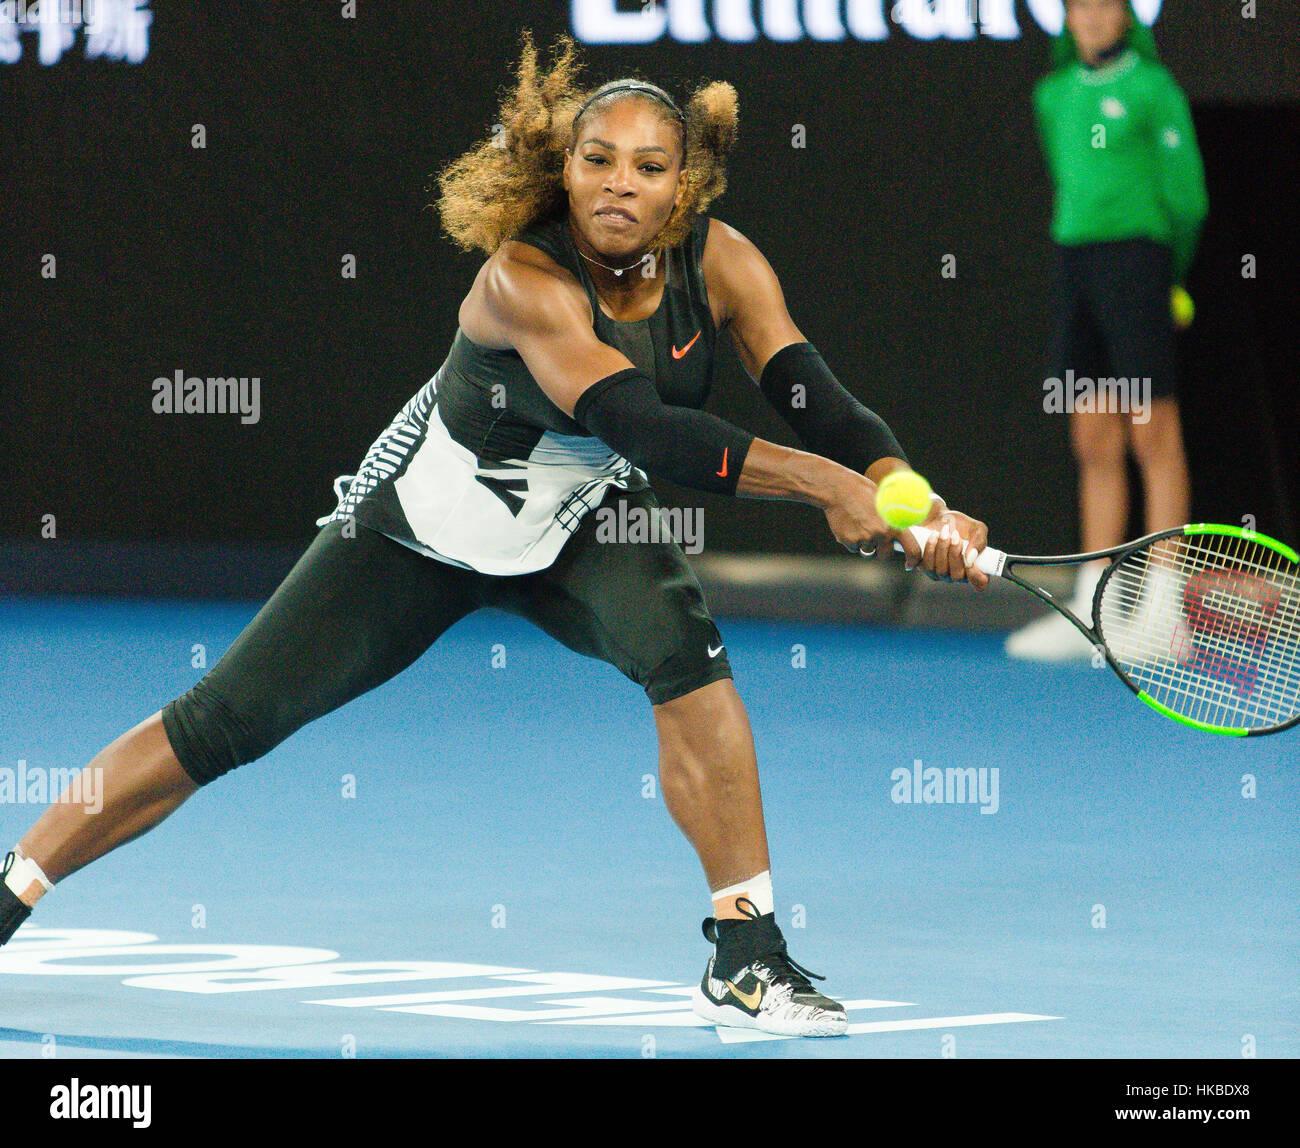 Melbourne, Australien. 28. Januar 2017. Serena Williams aus den USA während der 2017 Australian Open Damen Finale Stockfoto